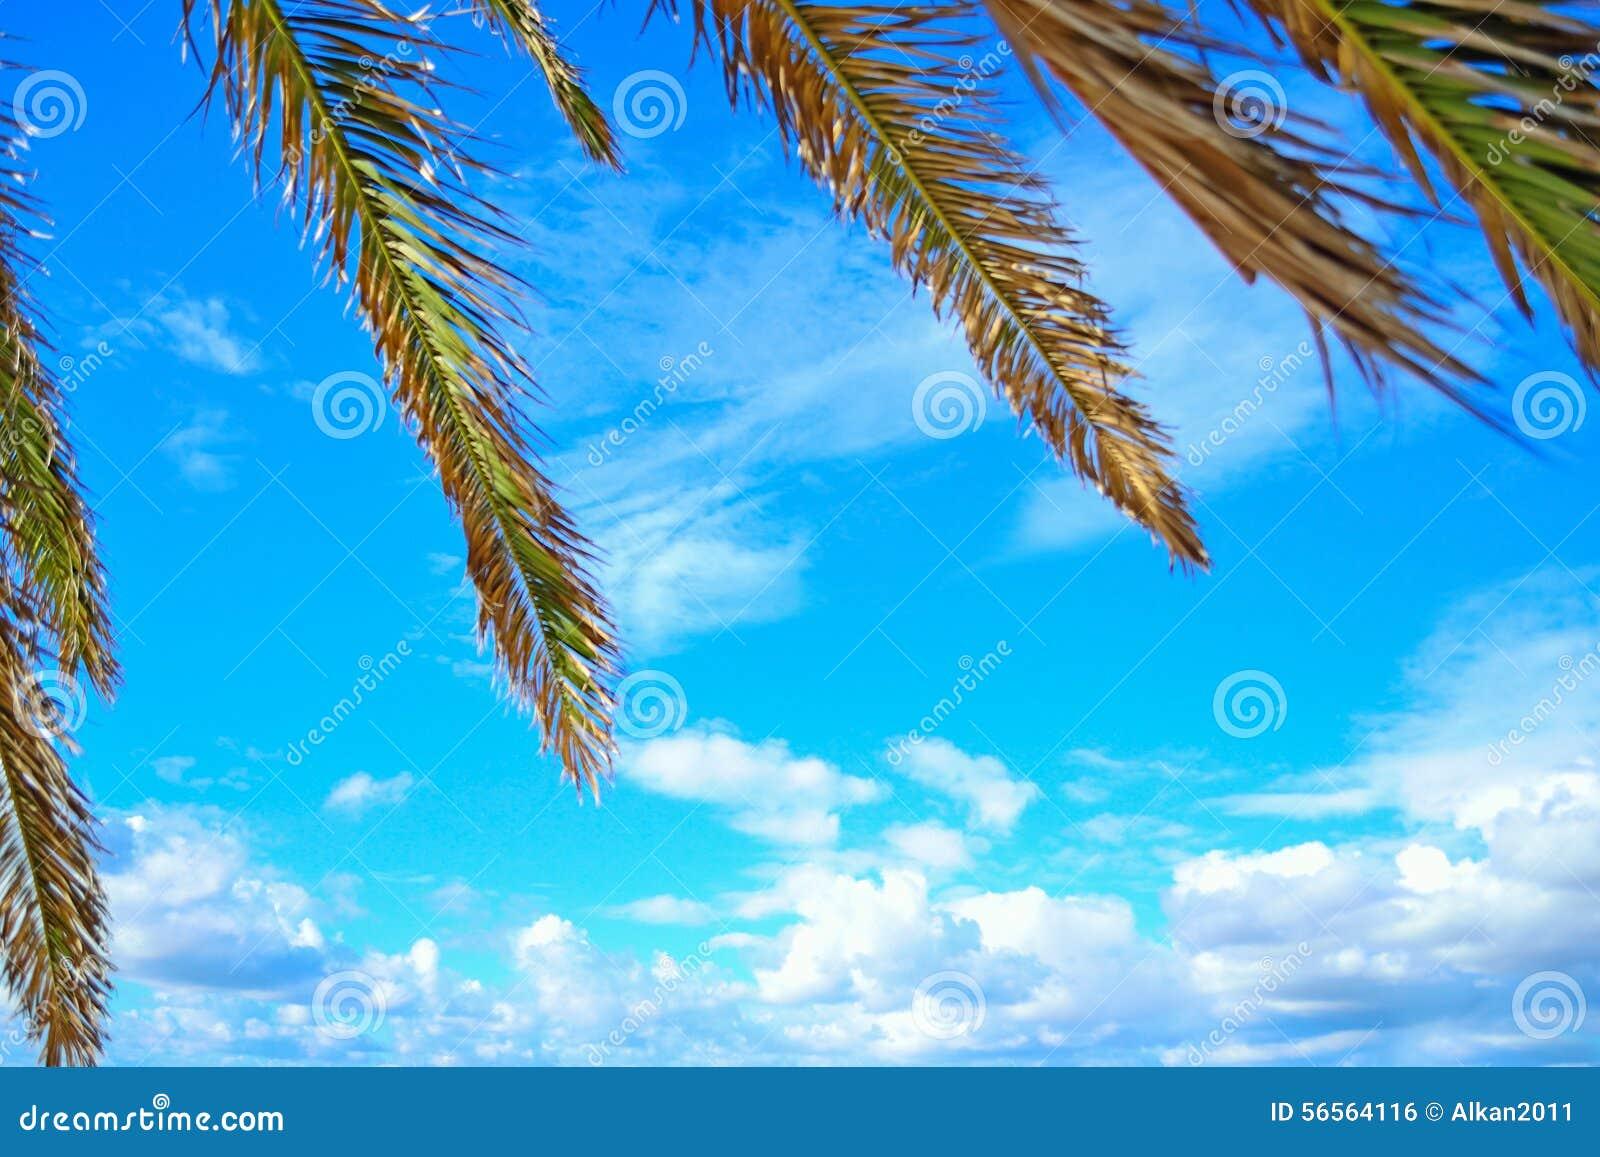 Download Κλάδοι φοινικών μια σαφή θερινή ημέρα στη Σαρδηνία Στοκ Εικόνες - εικόνα από ταξίδι, διακοπές: 56564116